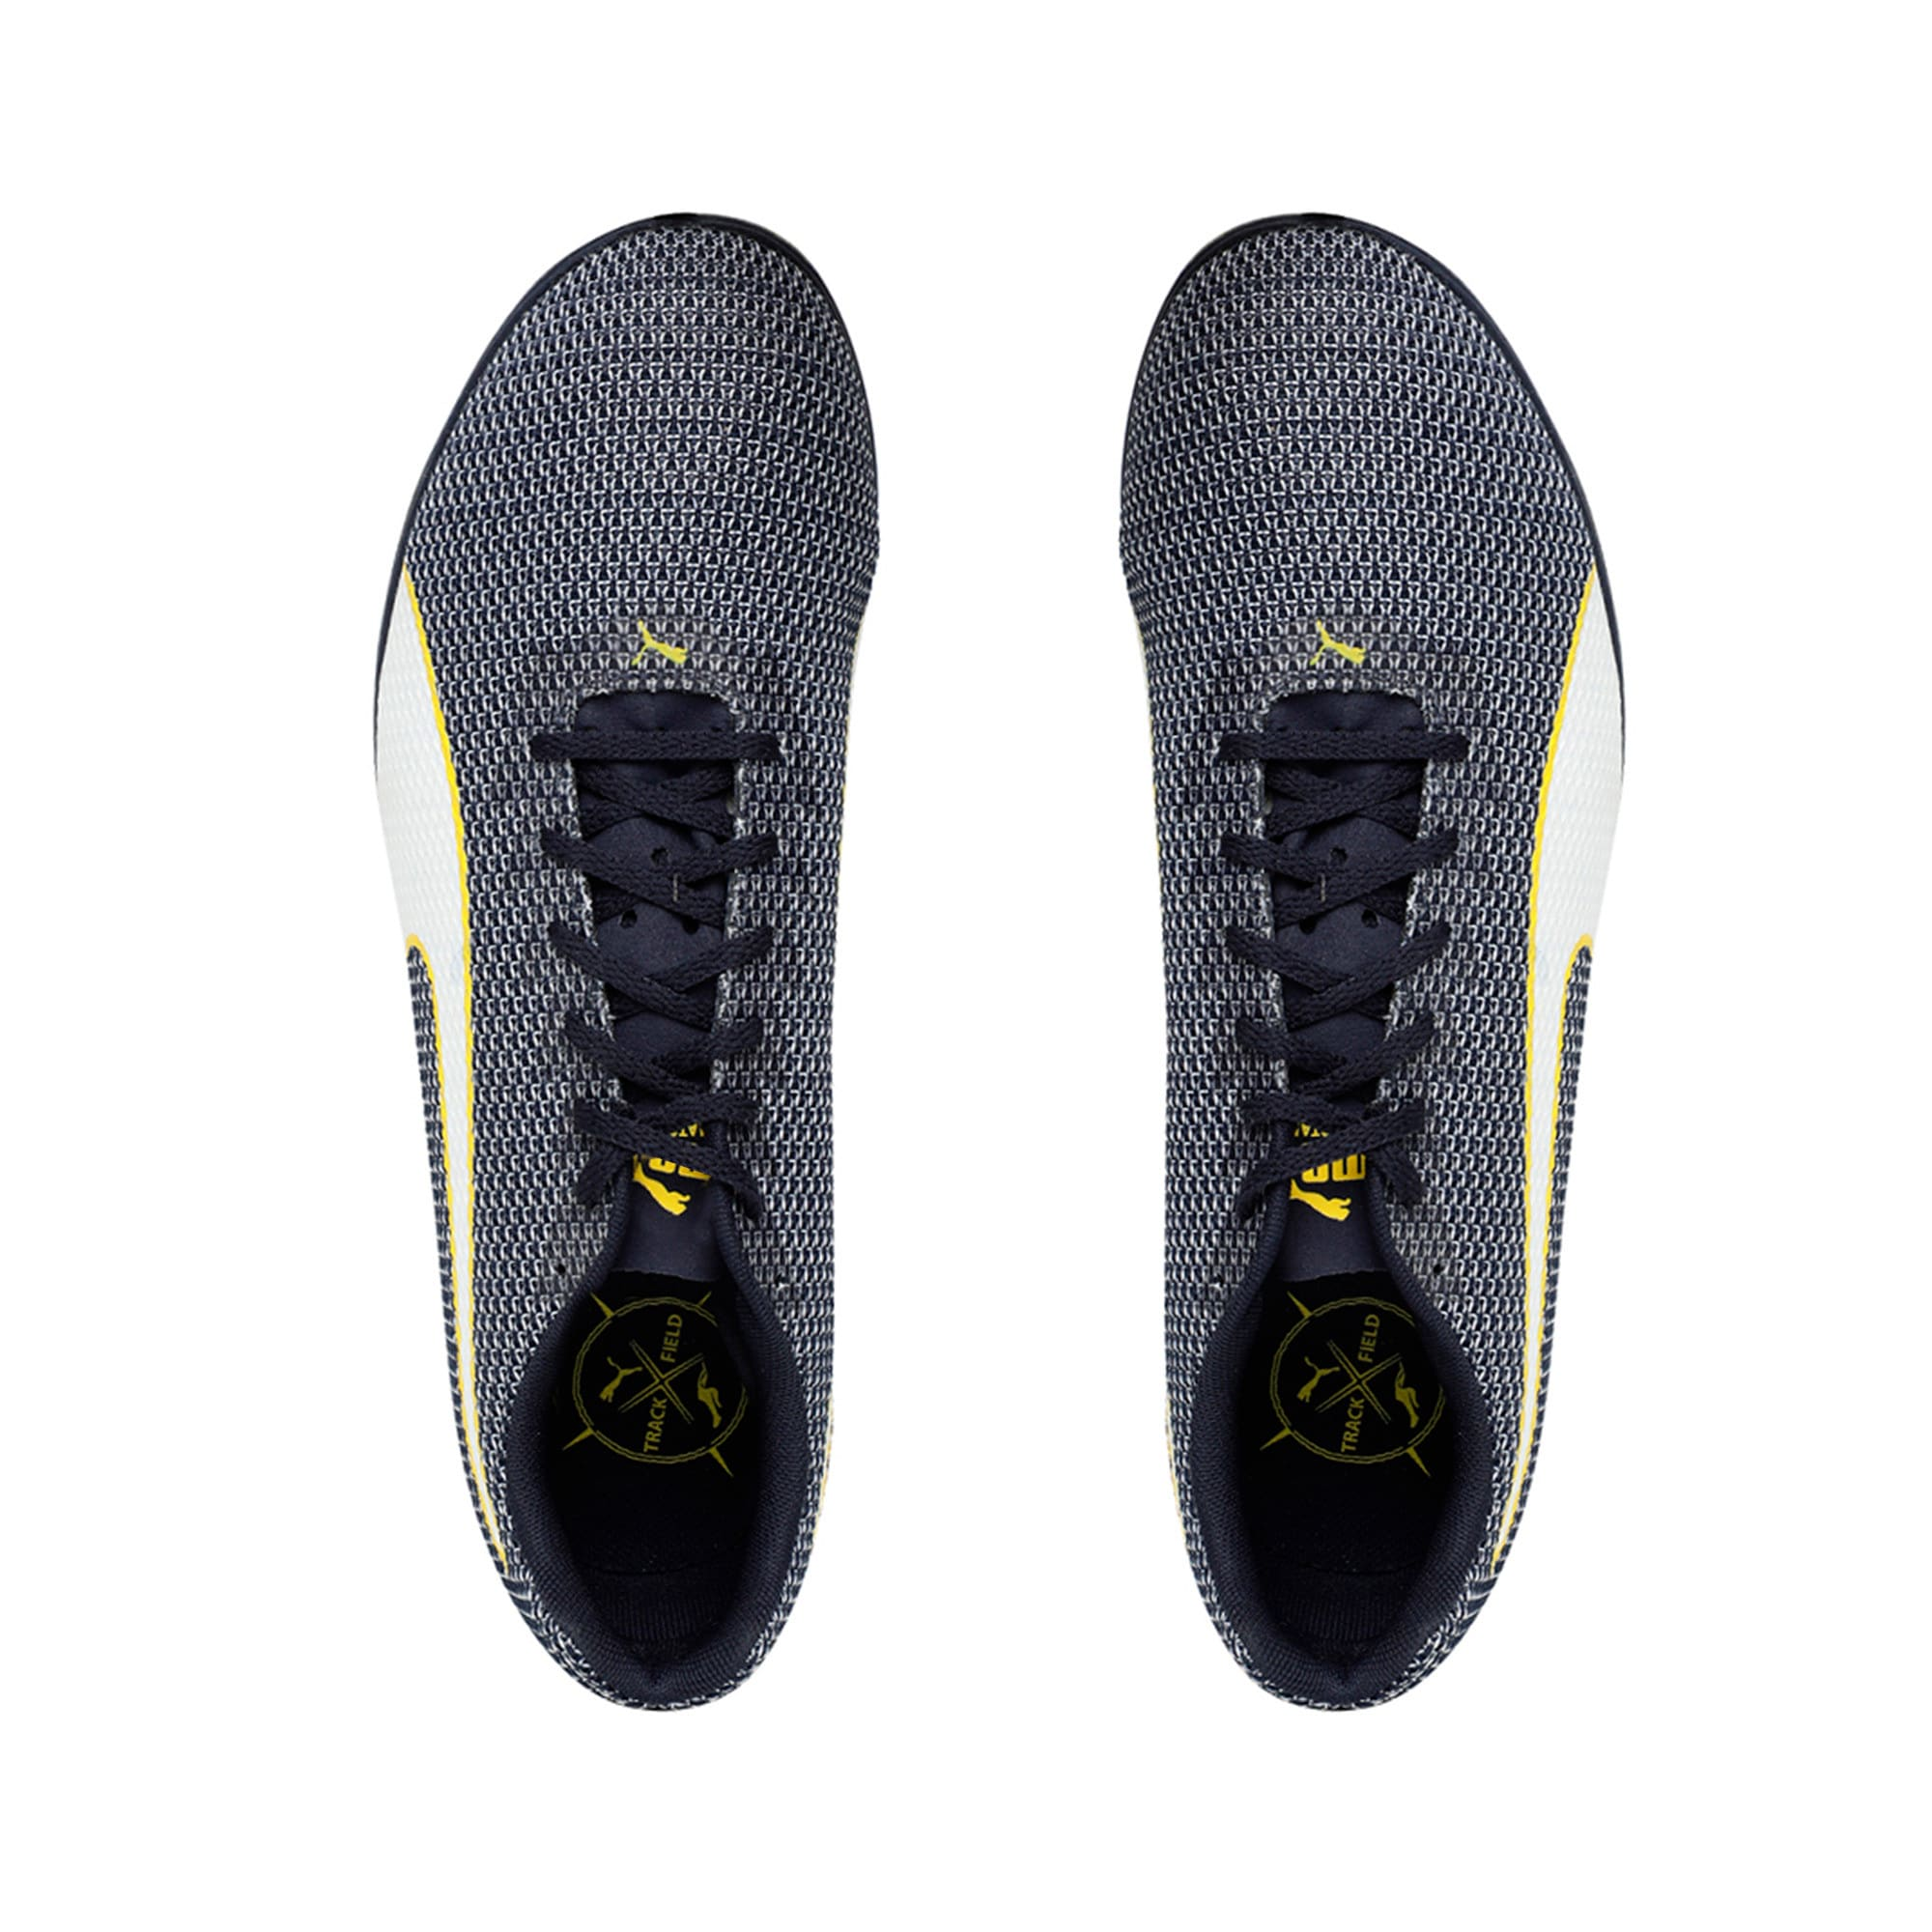 Thumbnail 3 of evoSPEED Distance 8 Men's Running Shoes, Peacoat-Blazing Yellow, medium-IND